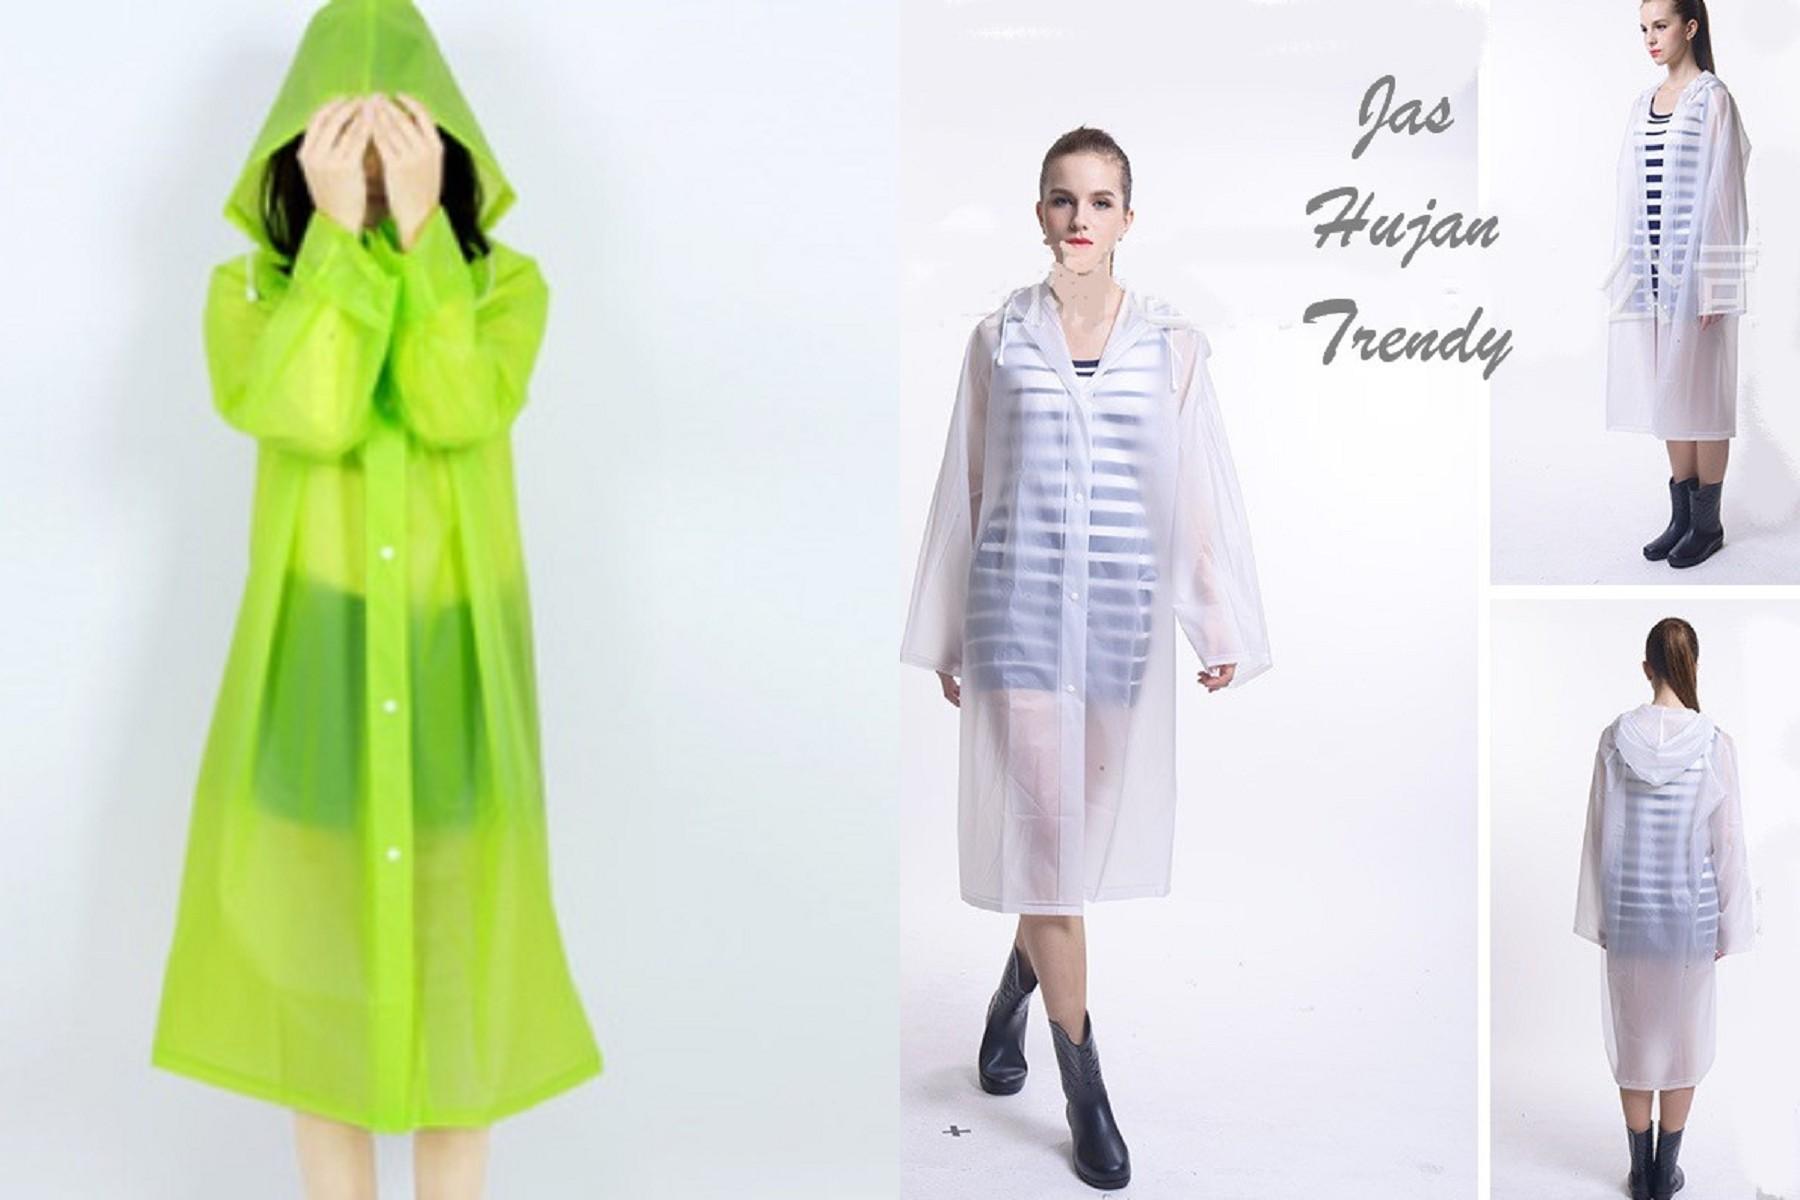 jas hujan wanita fashionable